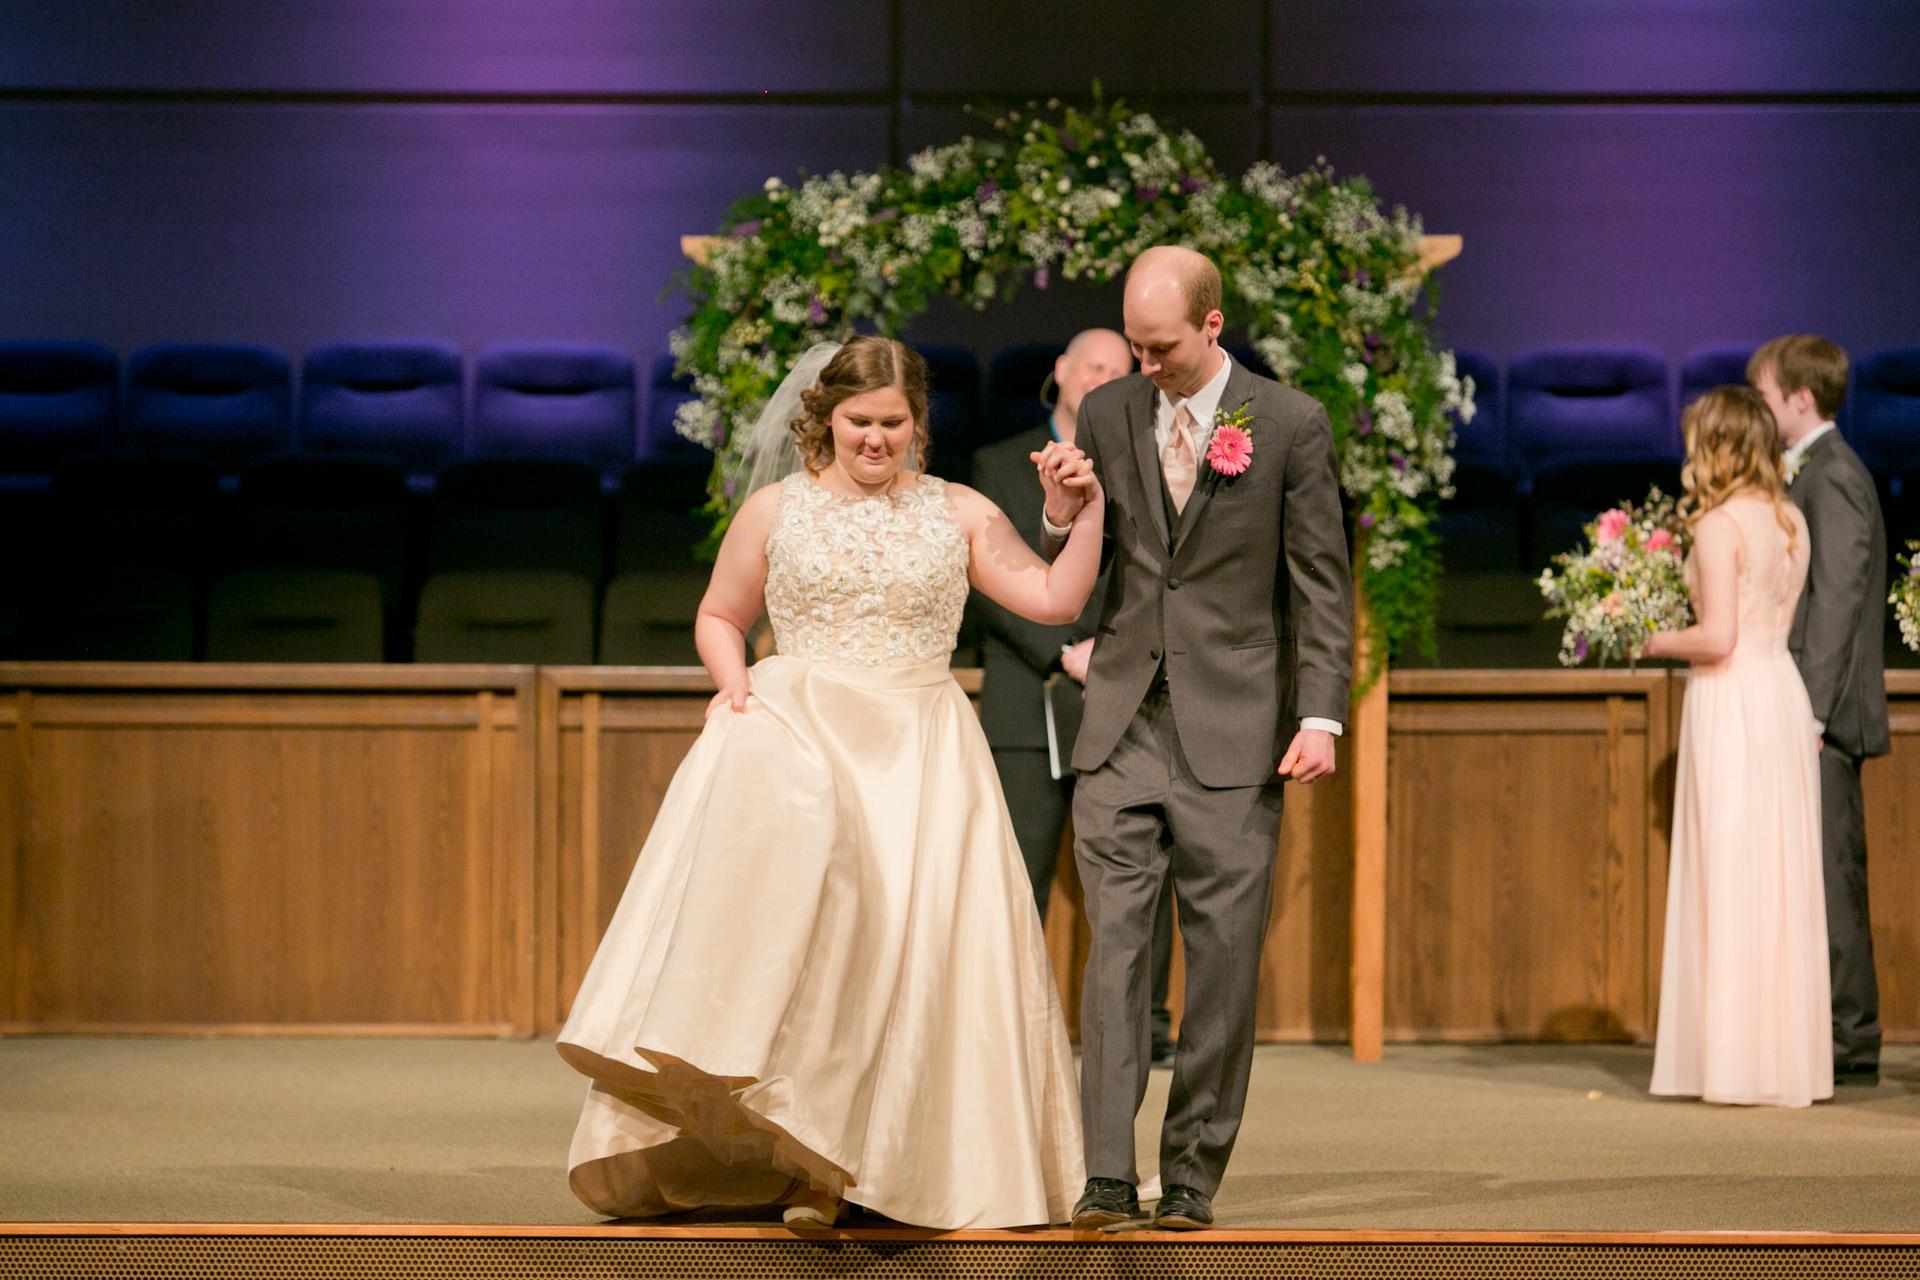 Iowa City wedding photographers amelia renee